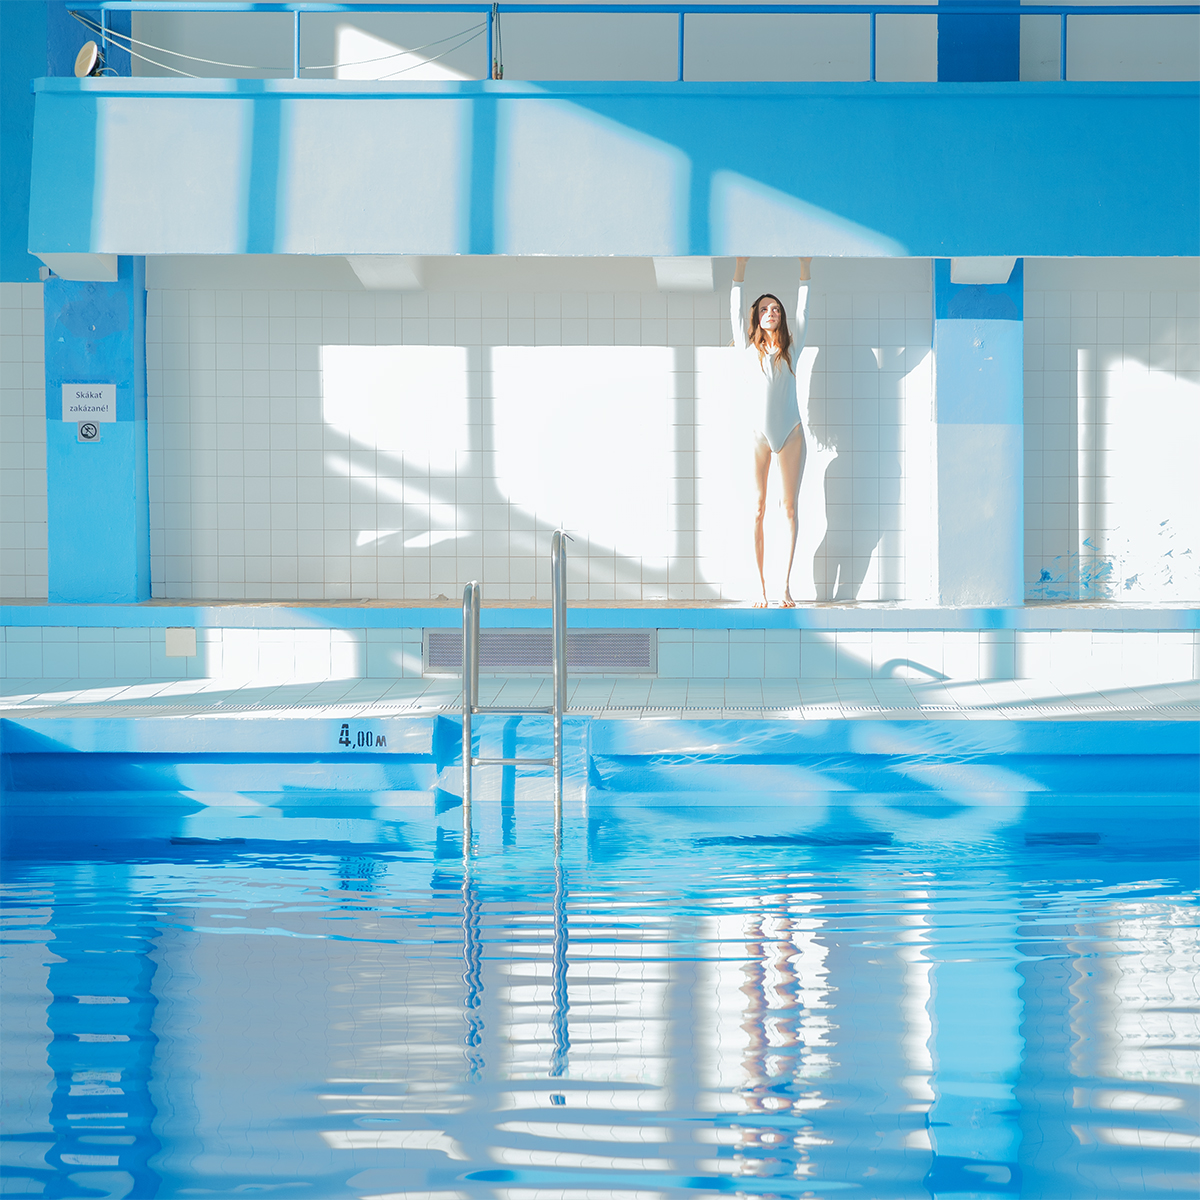 Maria Svarbova, Blue White Swimmer, Archival Pigment Print, 27 1/2 x 27 1/2 in (70 x 70 cm)